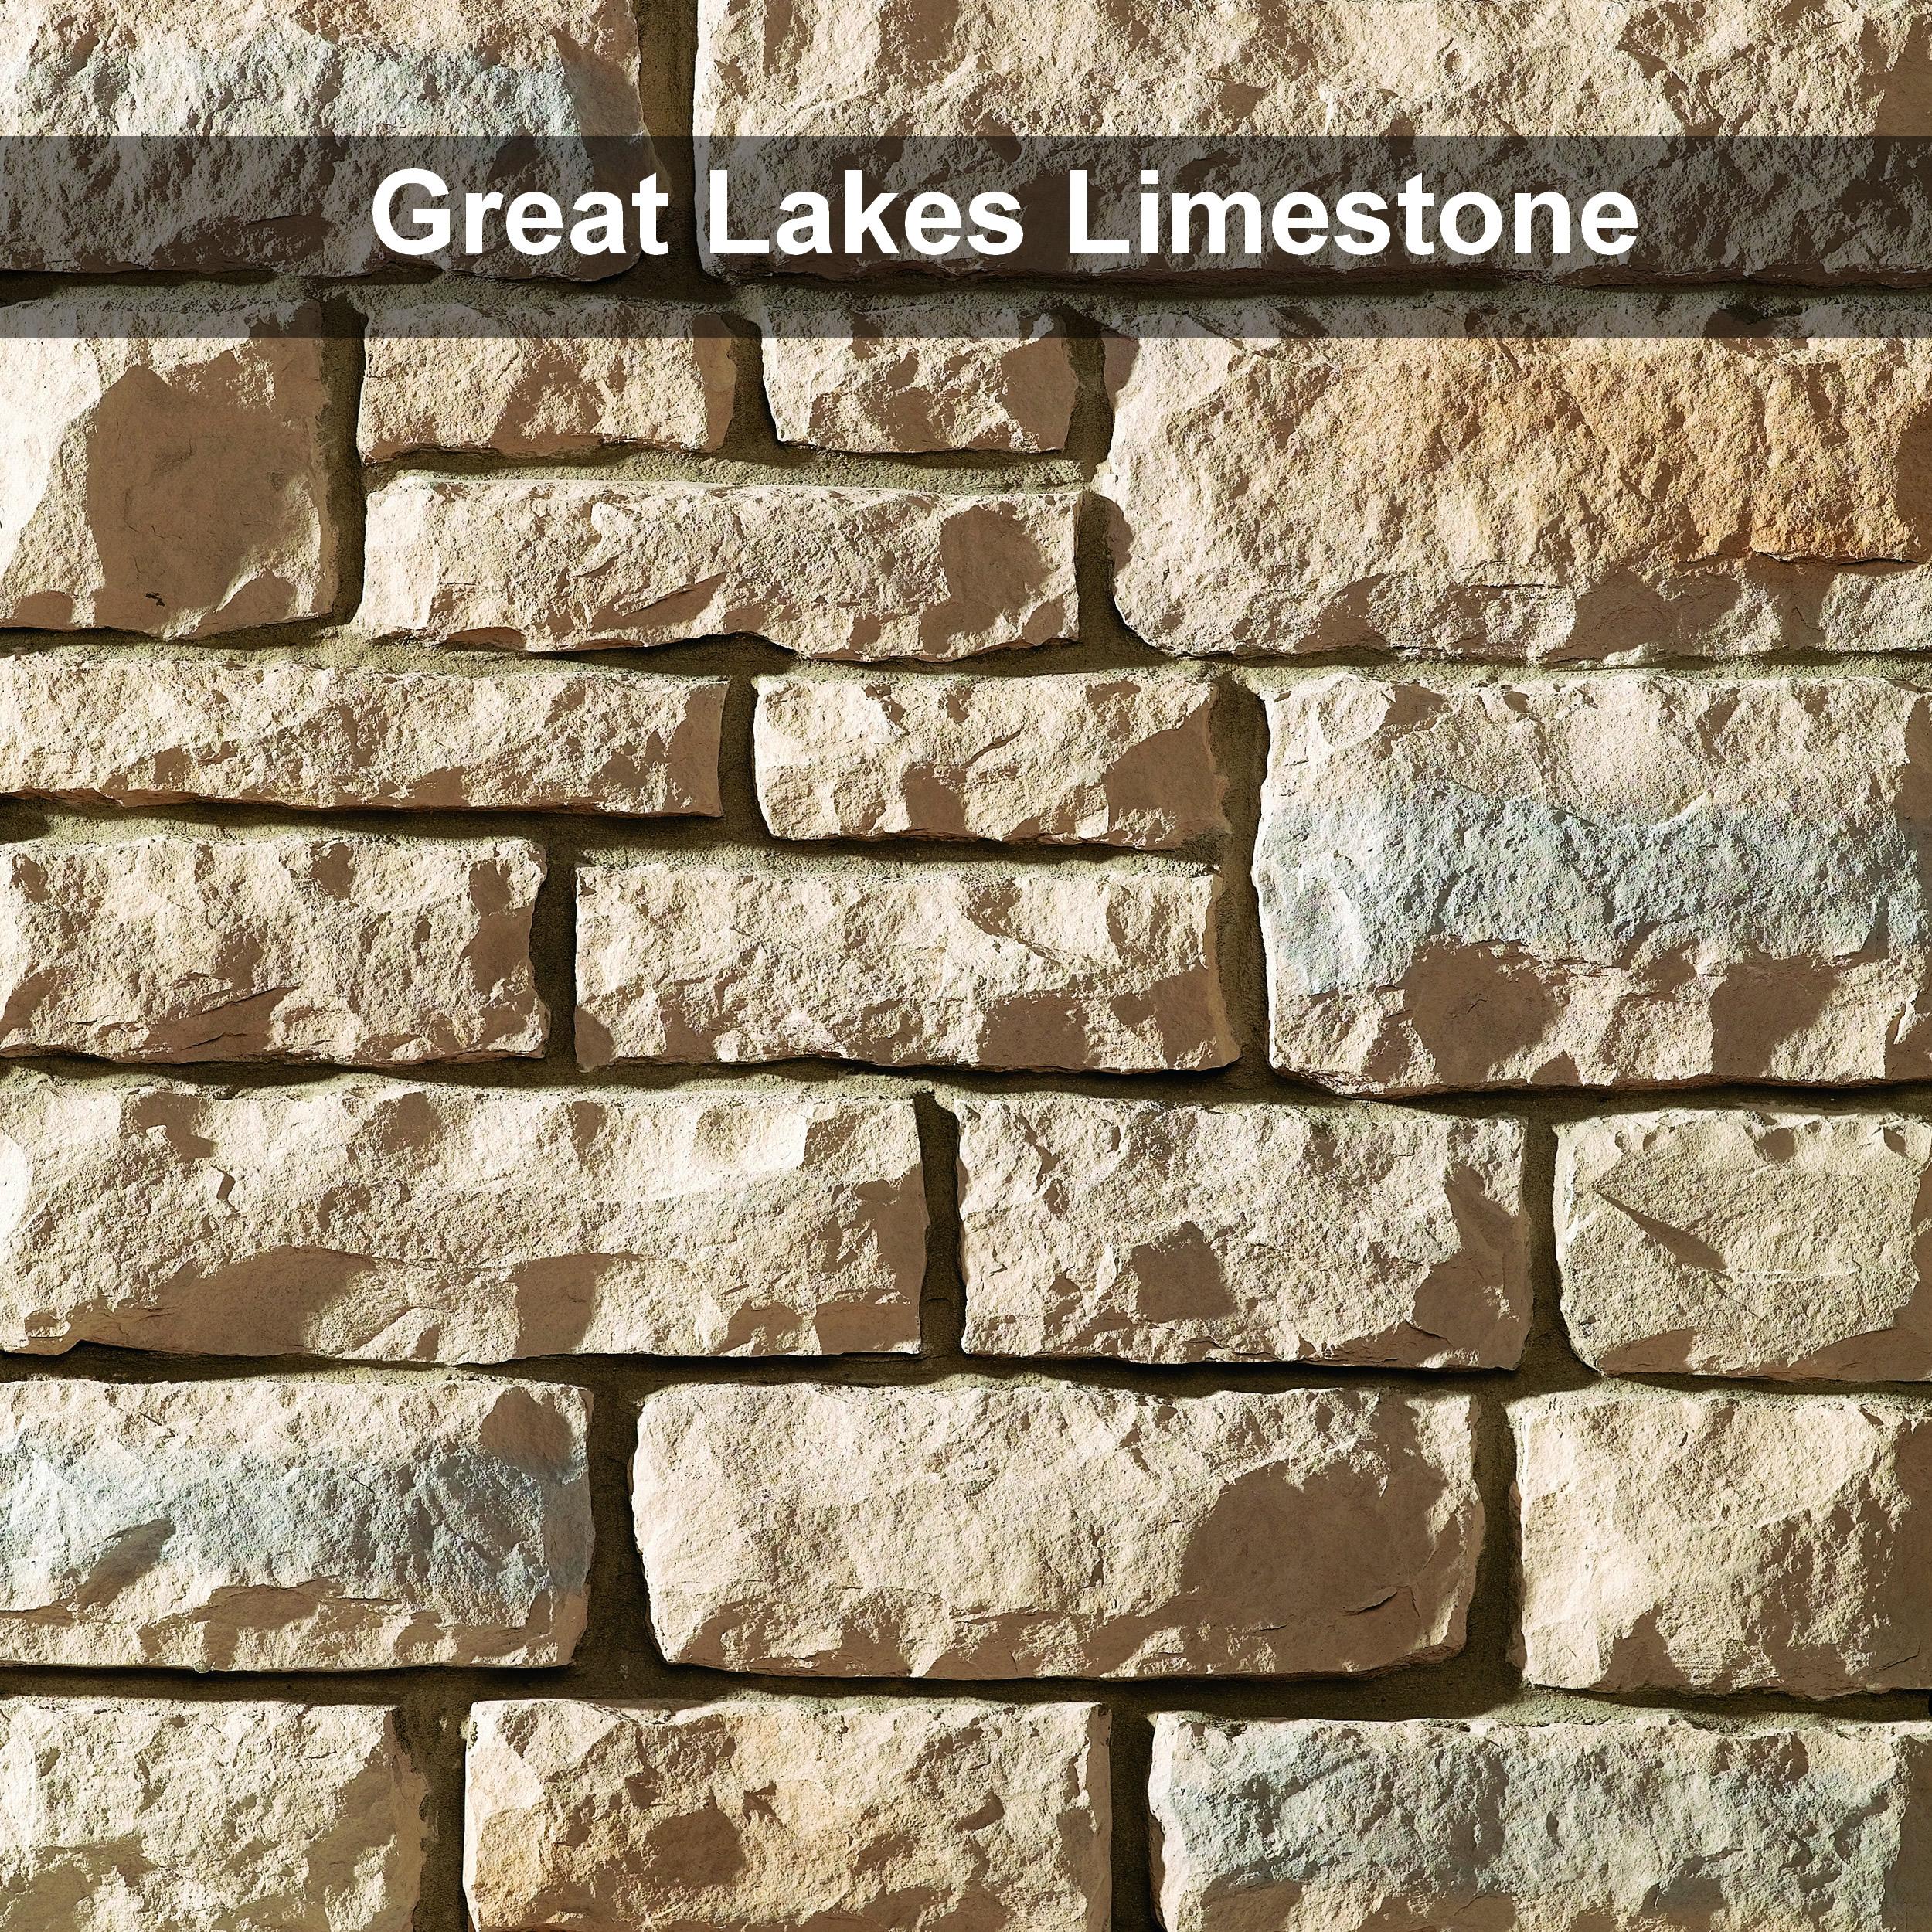 DQ_Limestone_Great Lakes_Profile.jpg